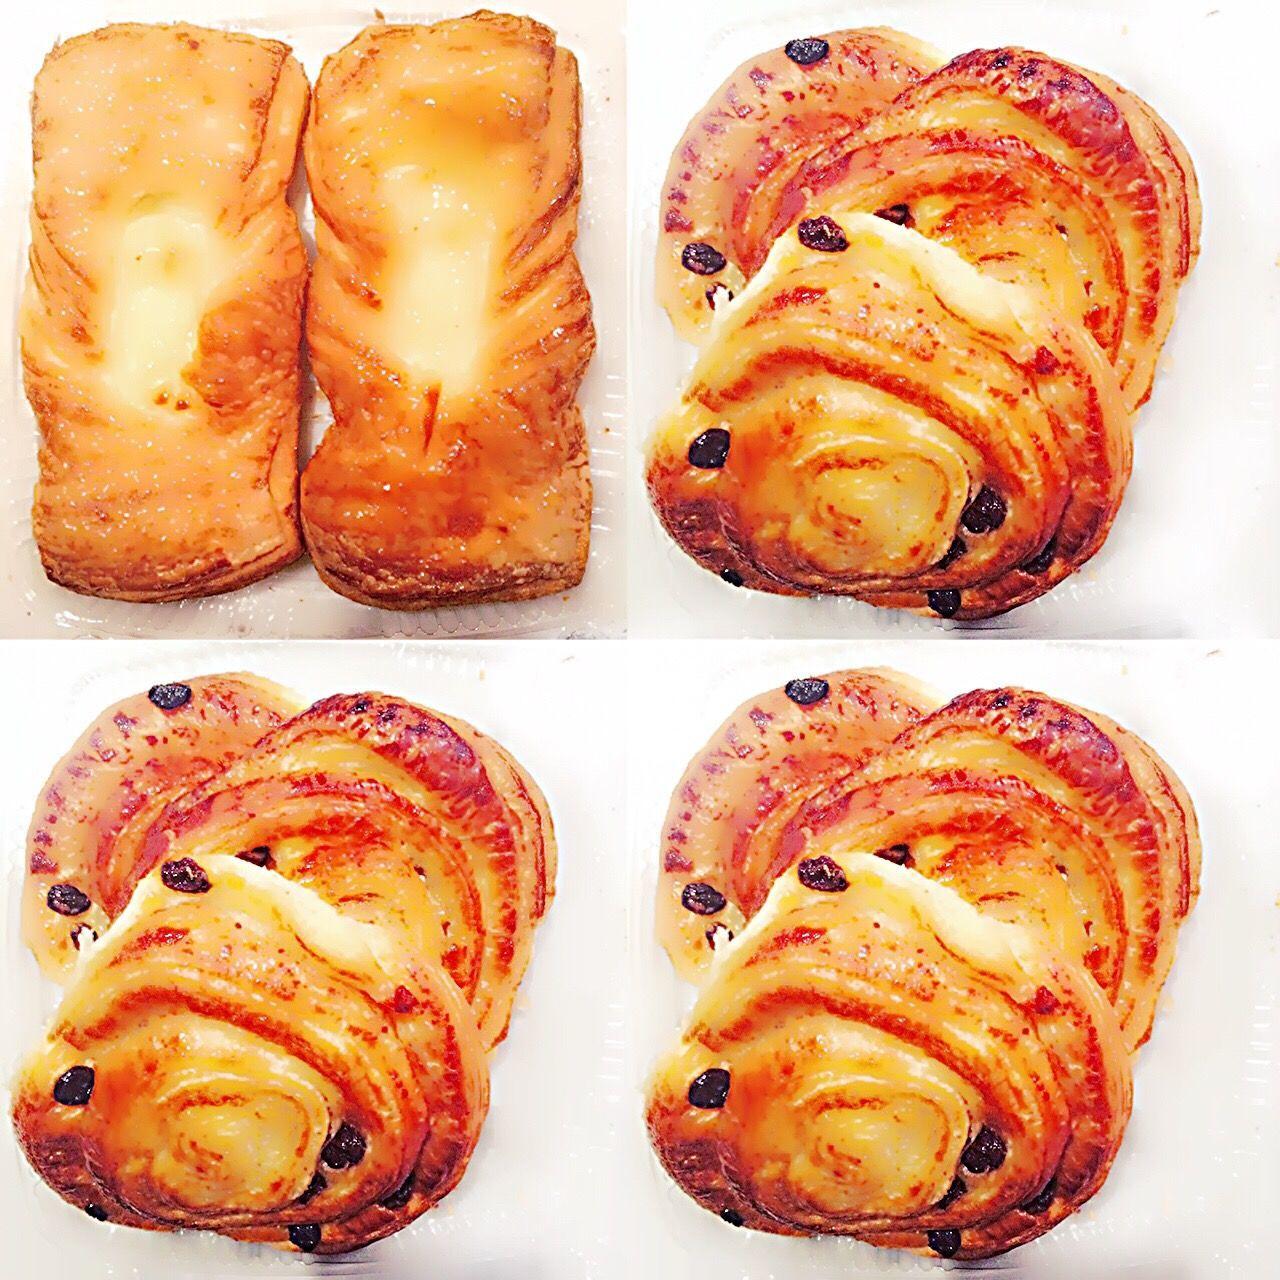 Morning Eating Pain Aux Raisins Laëtit Raisin Roll Biroche Bread Bread Roll Canelle 😛😍👅